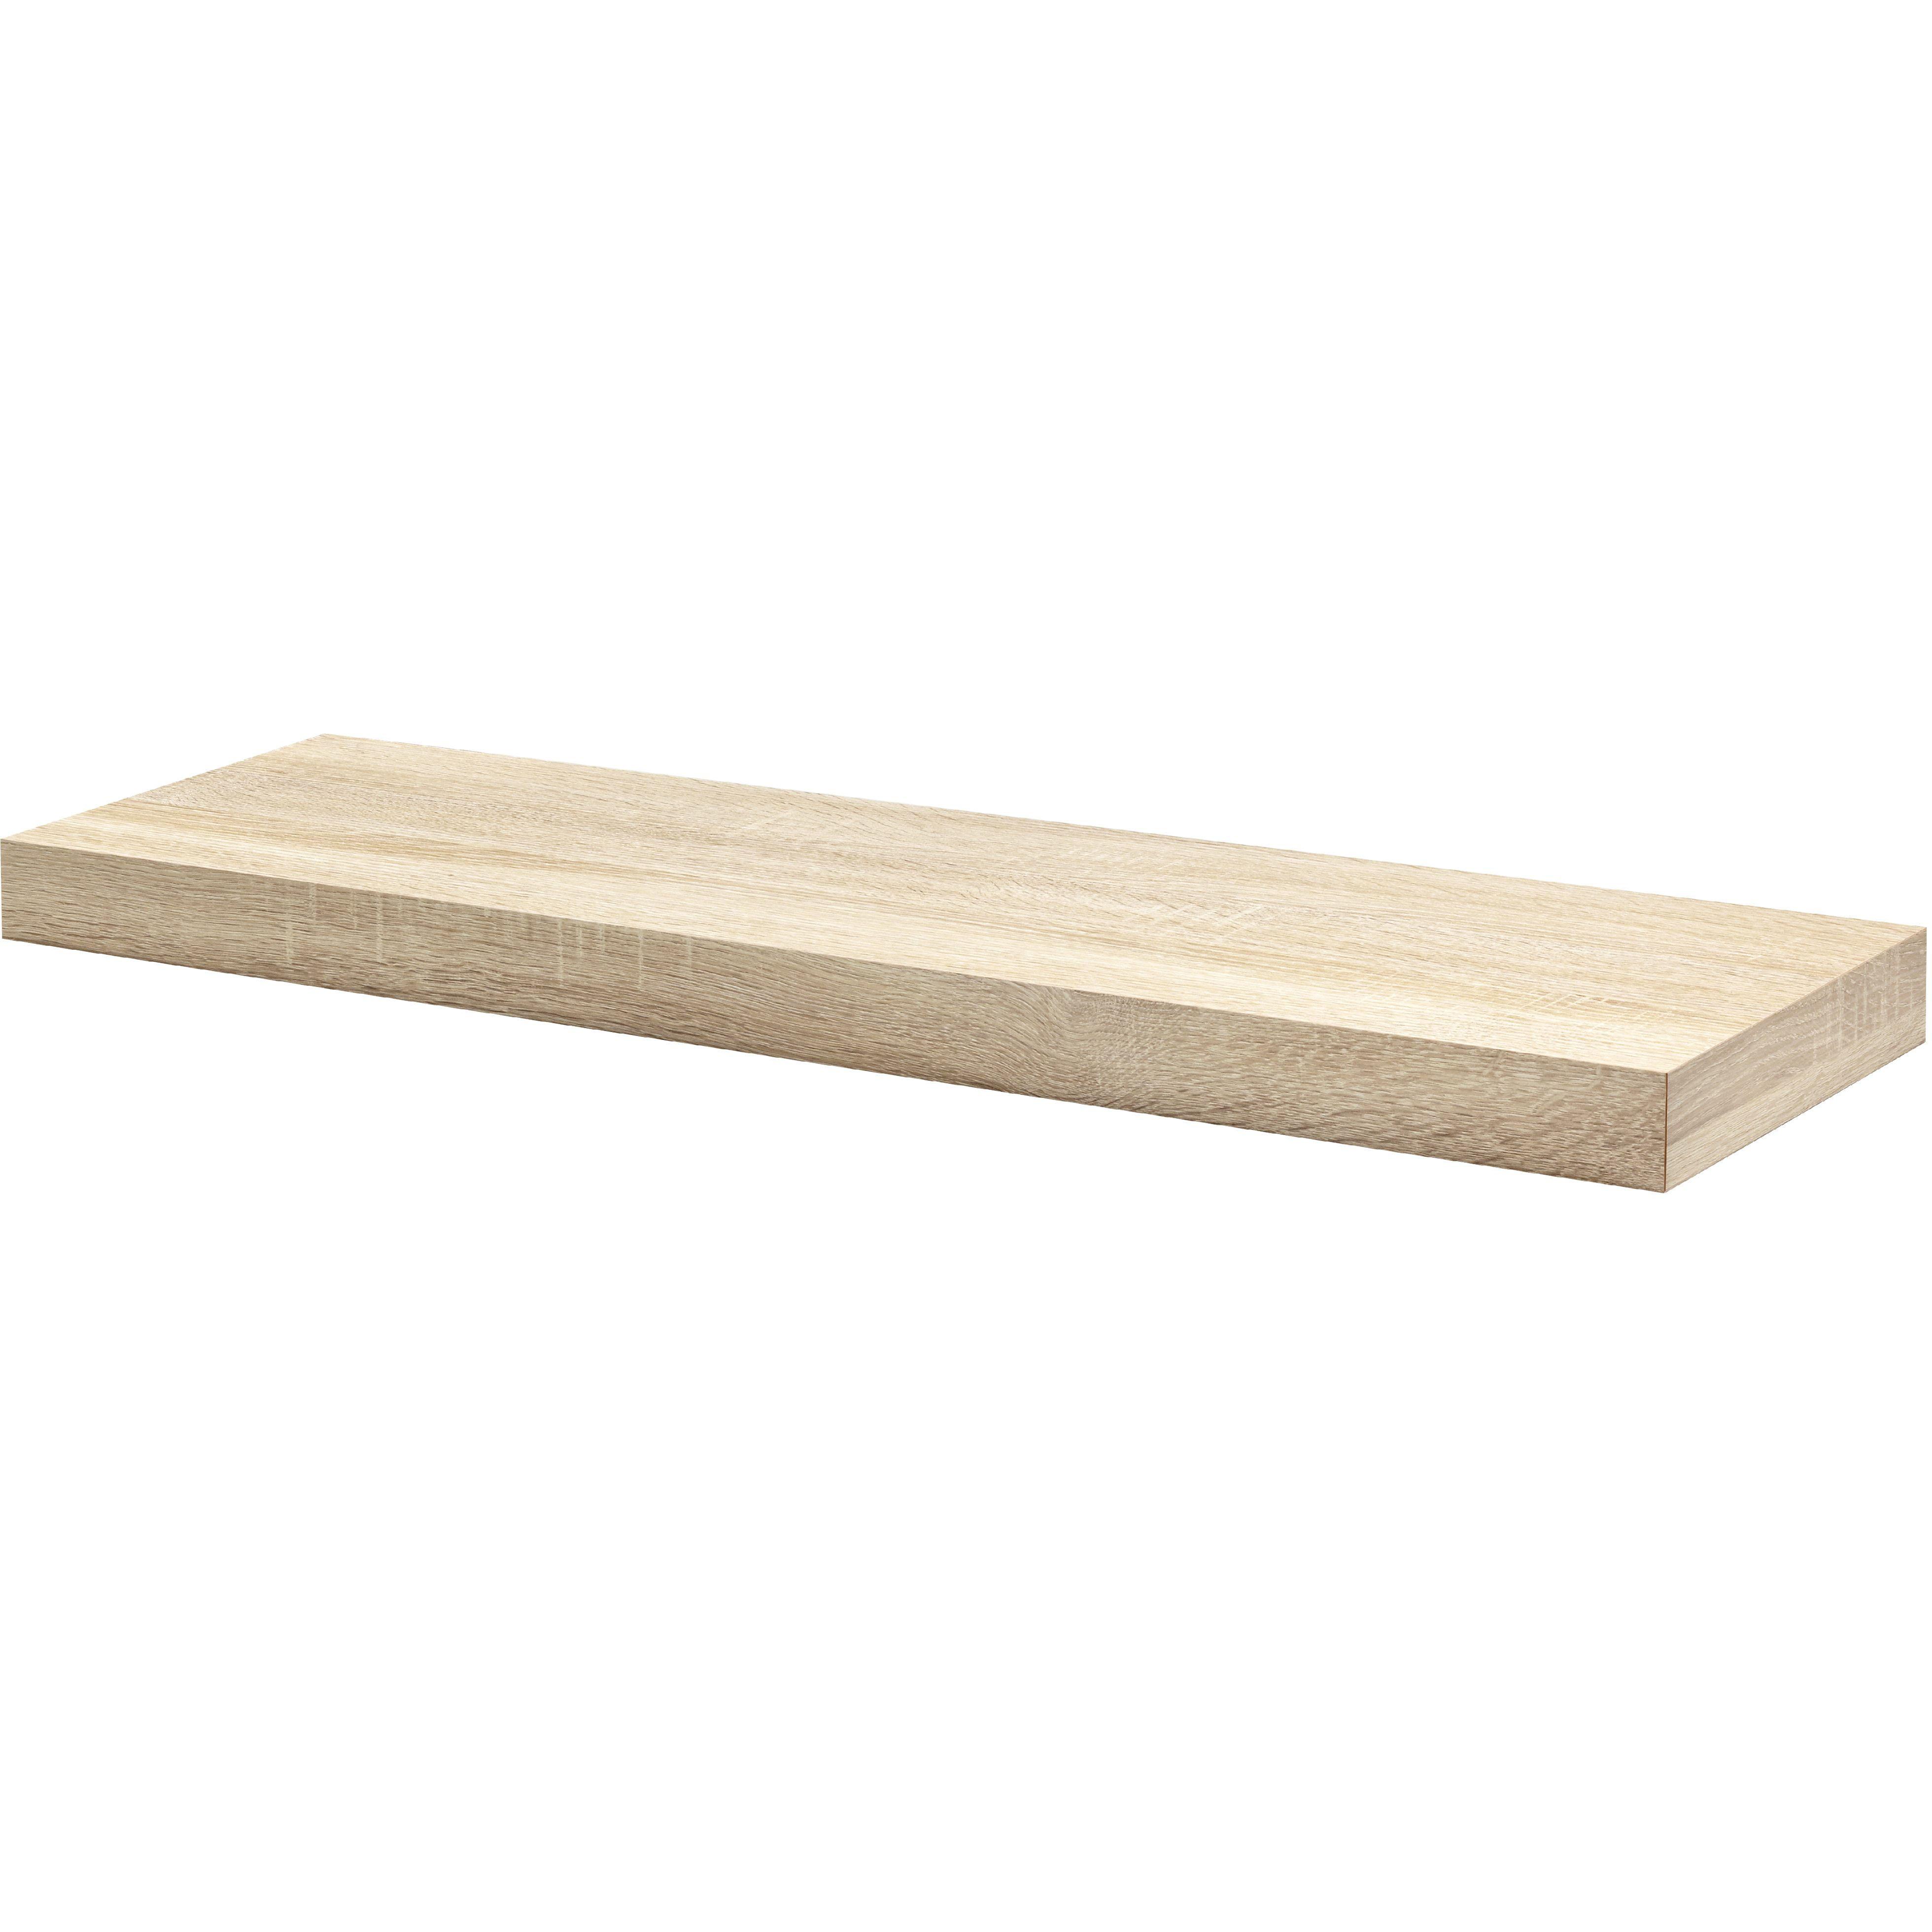 Oak Floating Shelf Kit 900x250x50mm - Mastershelf